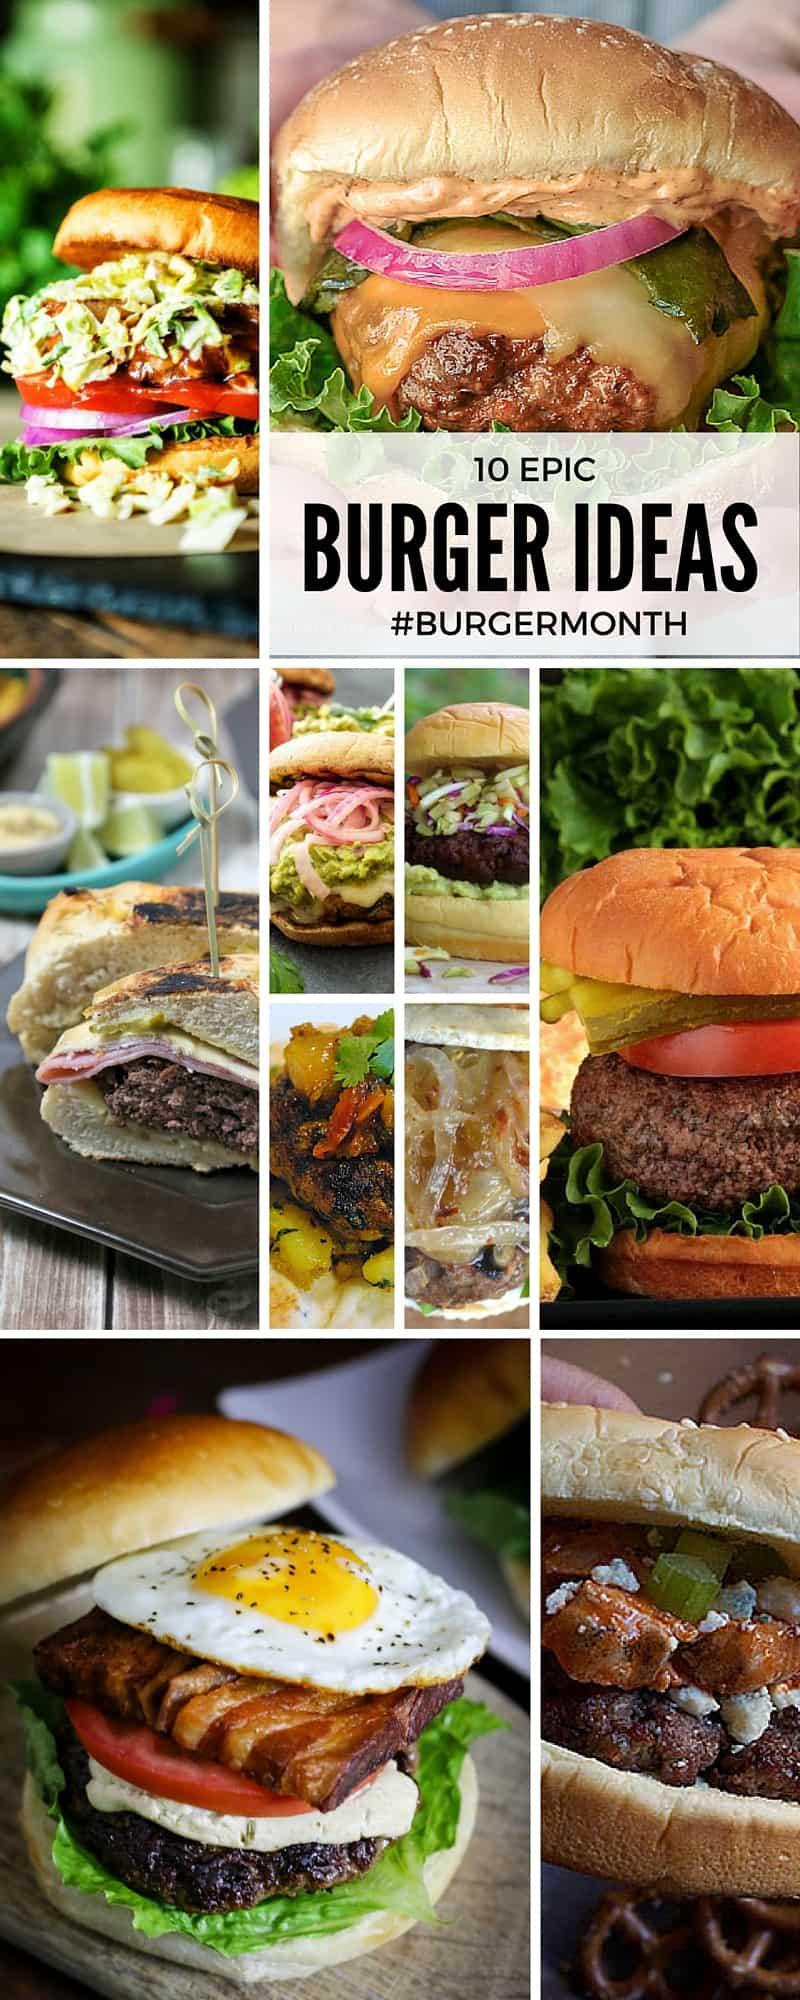 10 epic burger ideas